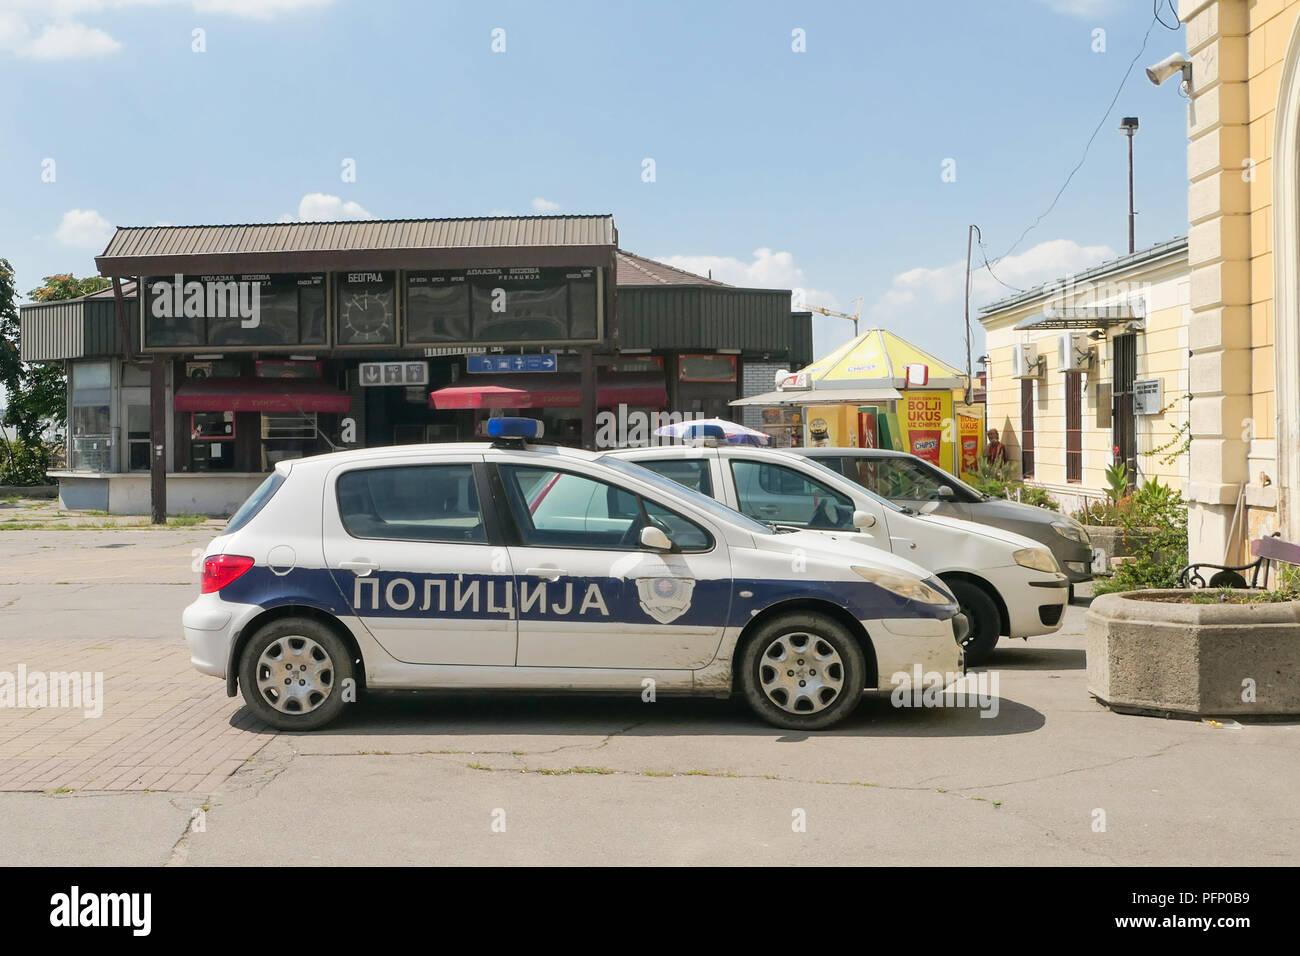 Serbian police car at the original historic railway station, Belgrade, Serbia - Stock Image